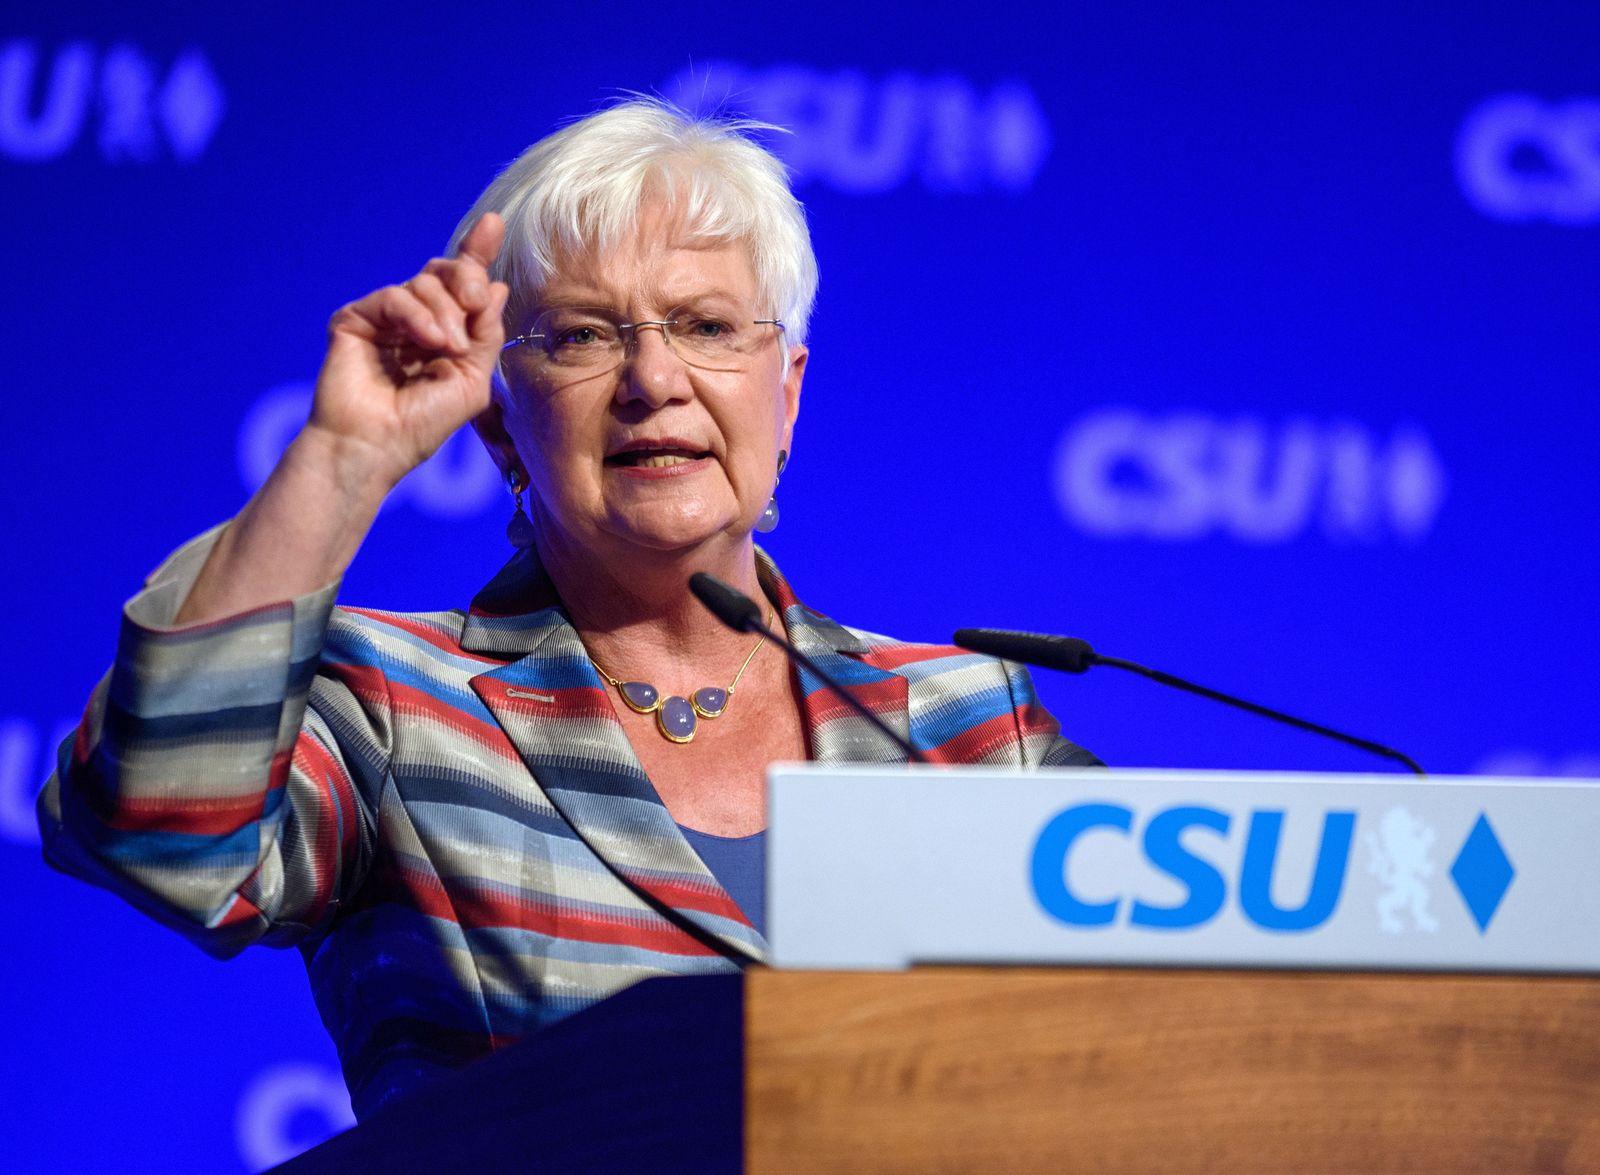 Bundestagsabgeordnete/ Gerda Hasselfeldt